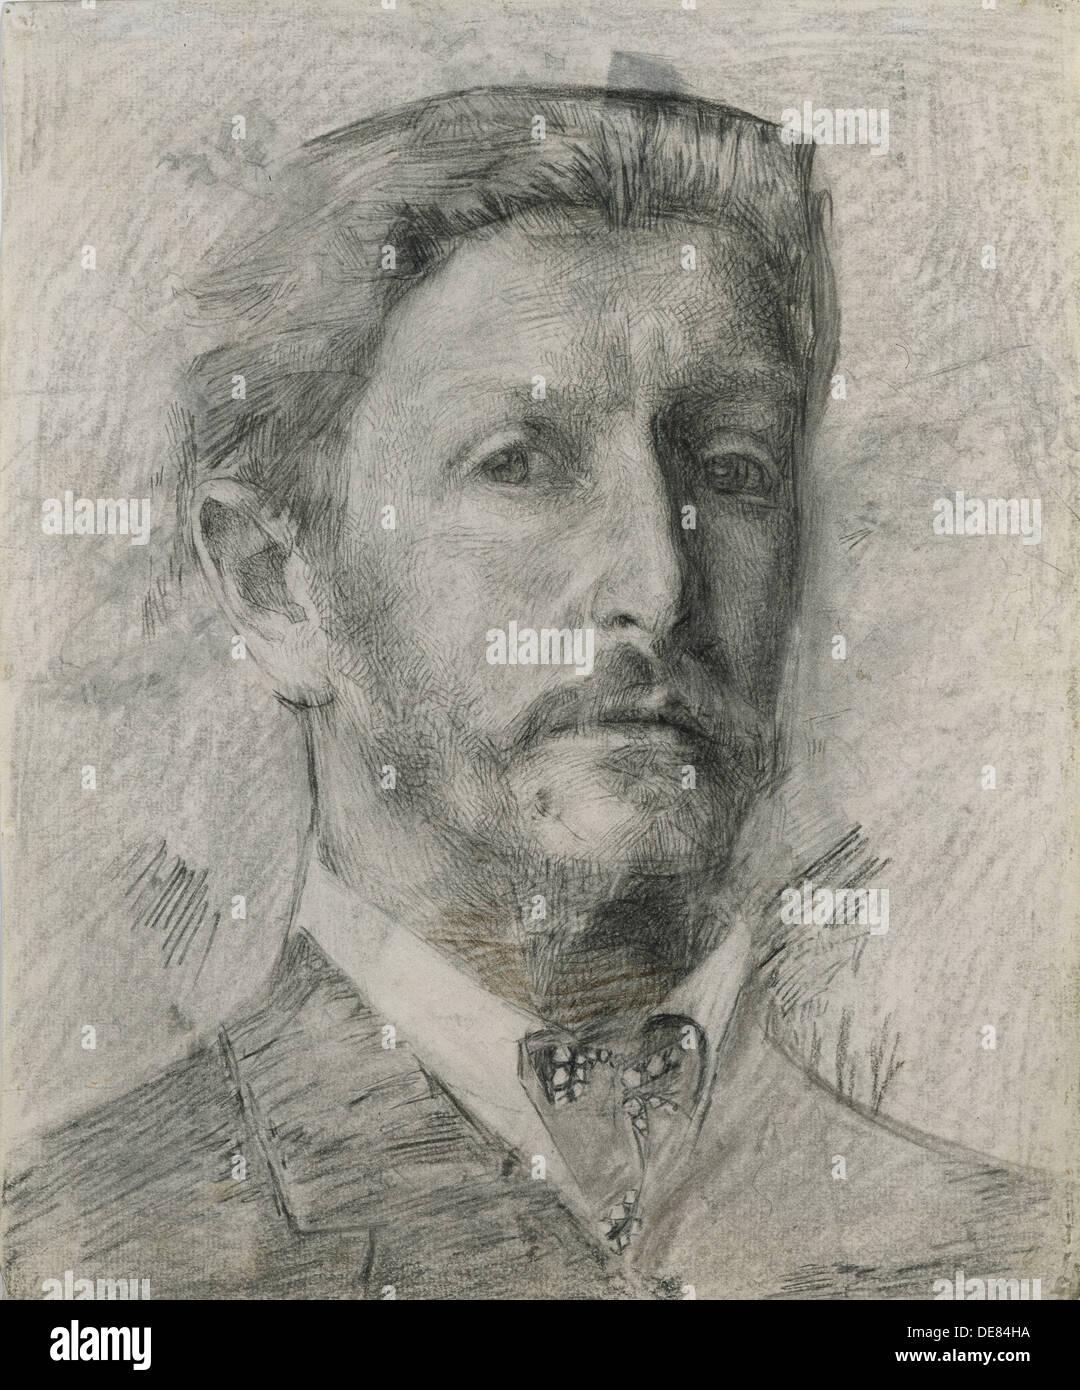 Self-Portrait, 1904-1905. Artist: Vrubel, Mikhail Alexandrovich (1856-1910) - Stock Image